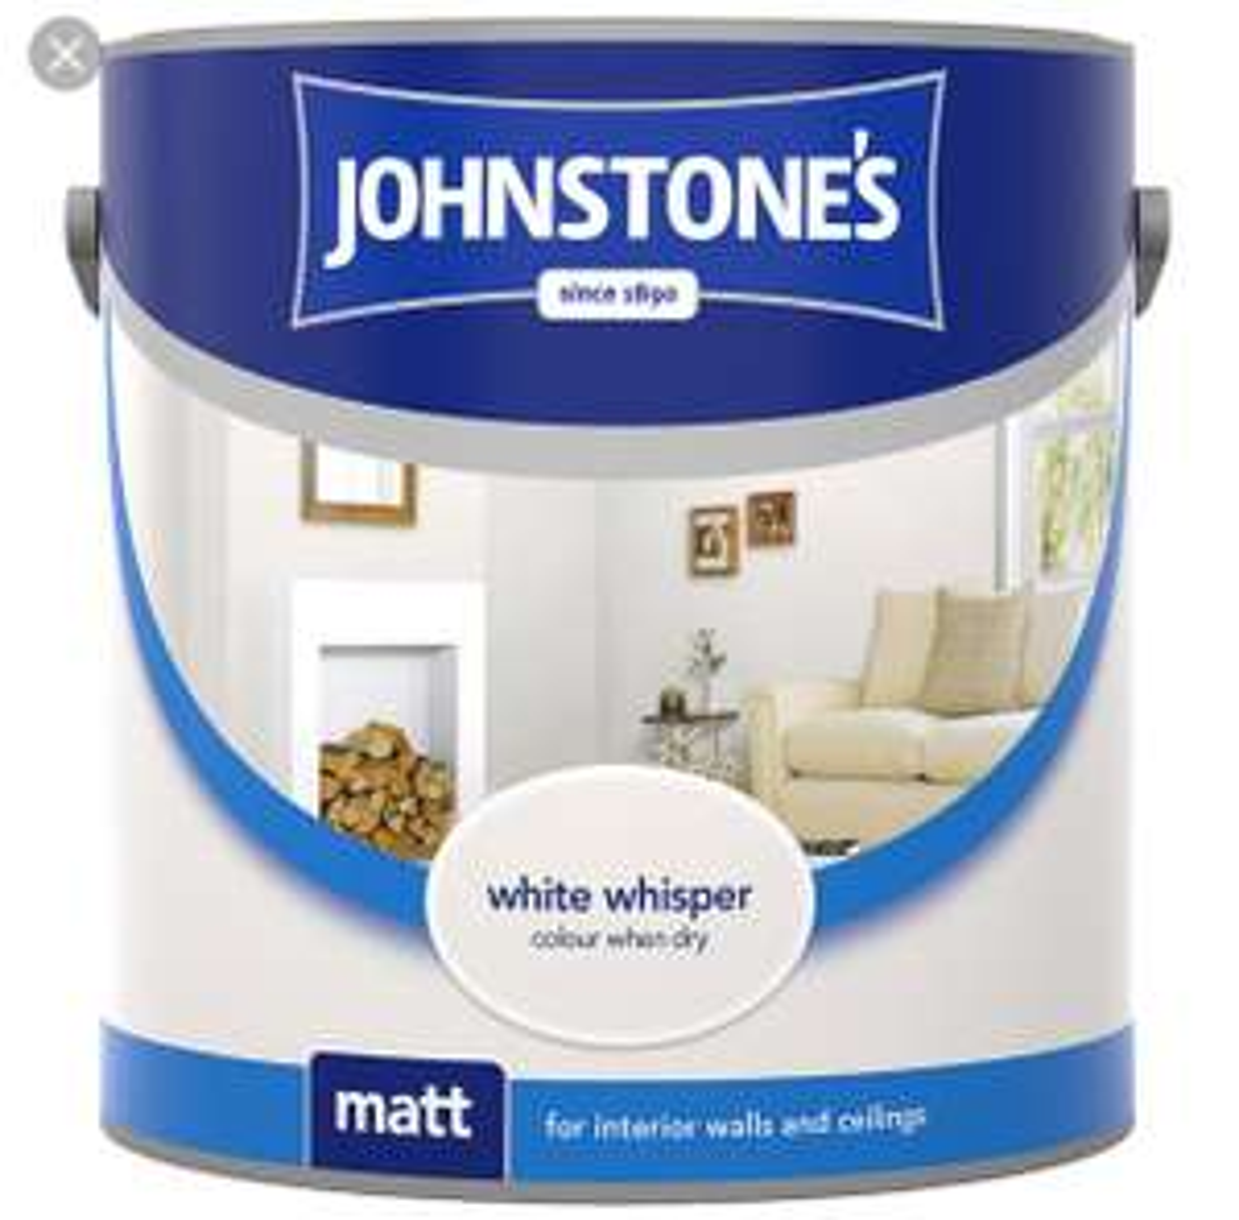 [Rollback] Johnstones 5 Litre Paint - Any colour £8 @ Asda